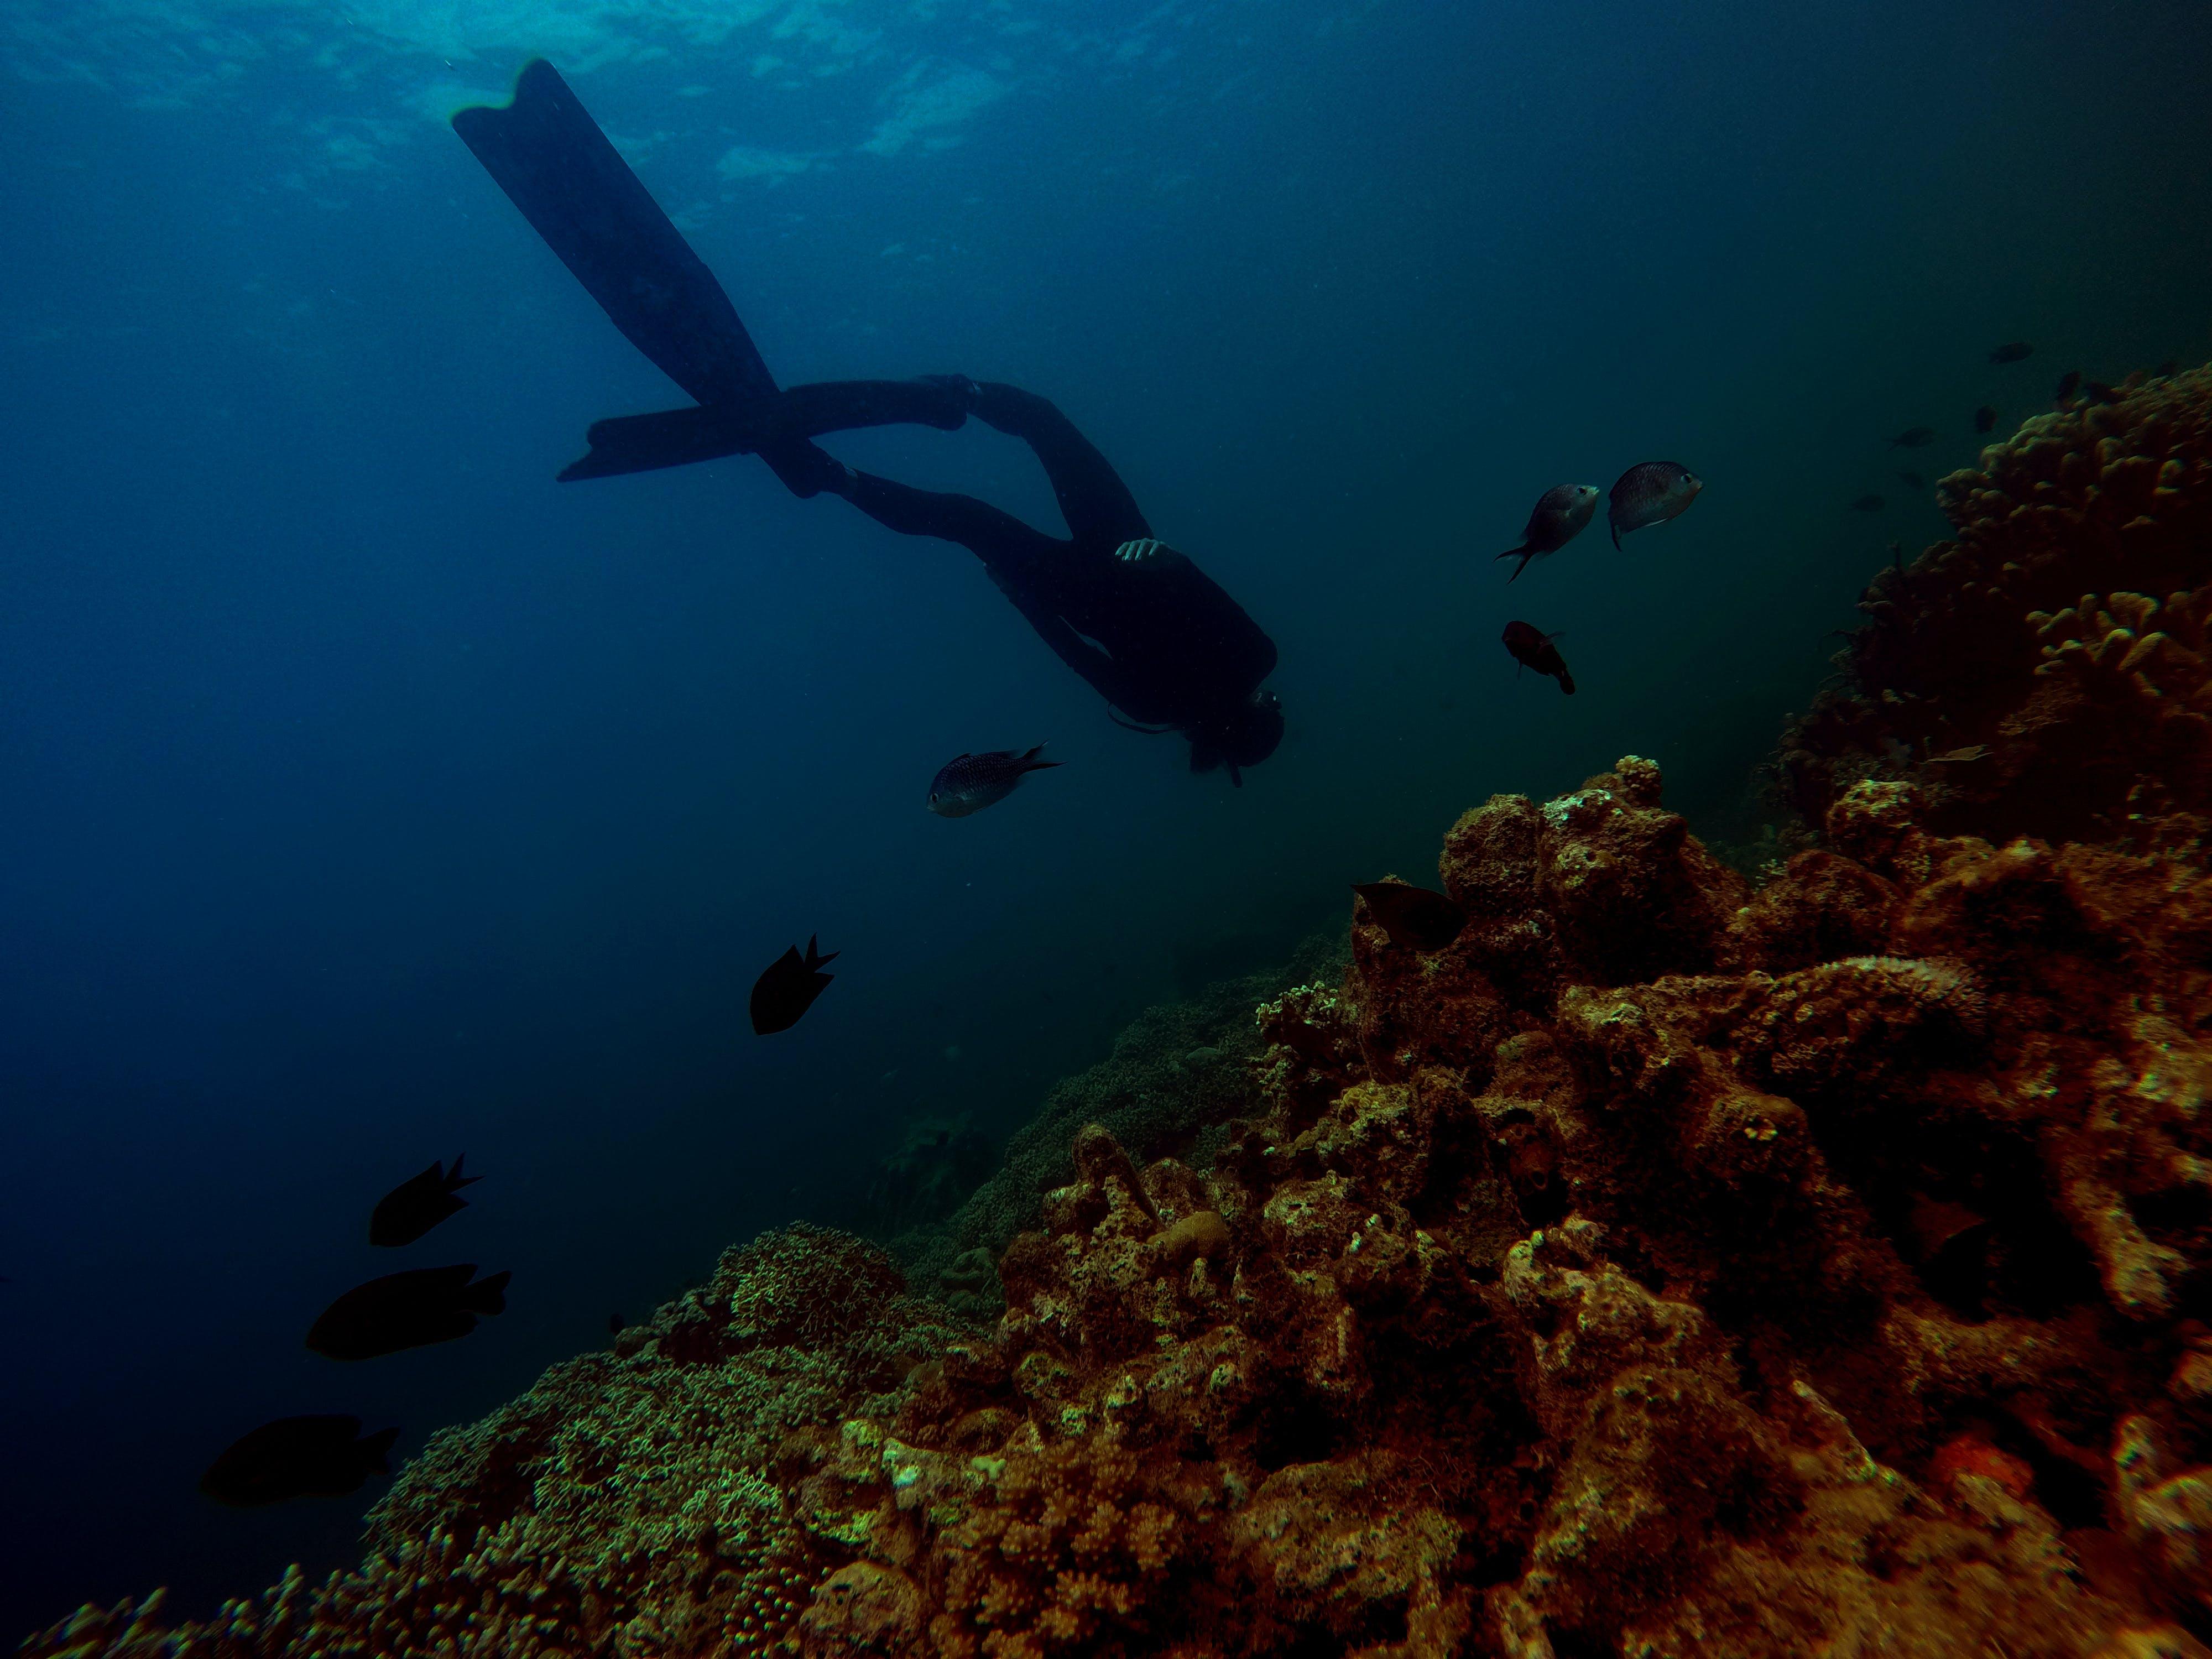 Základová fotografie zdarma na téma hluboký, korály, mokrý, osoba